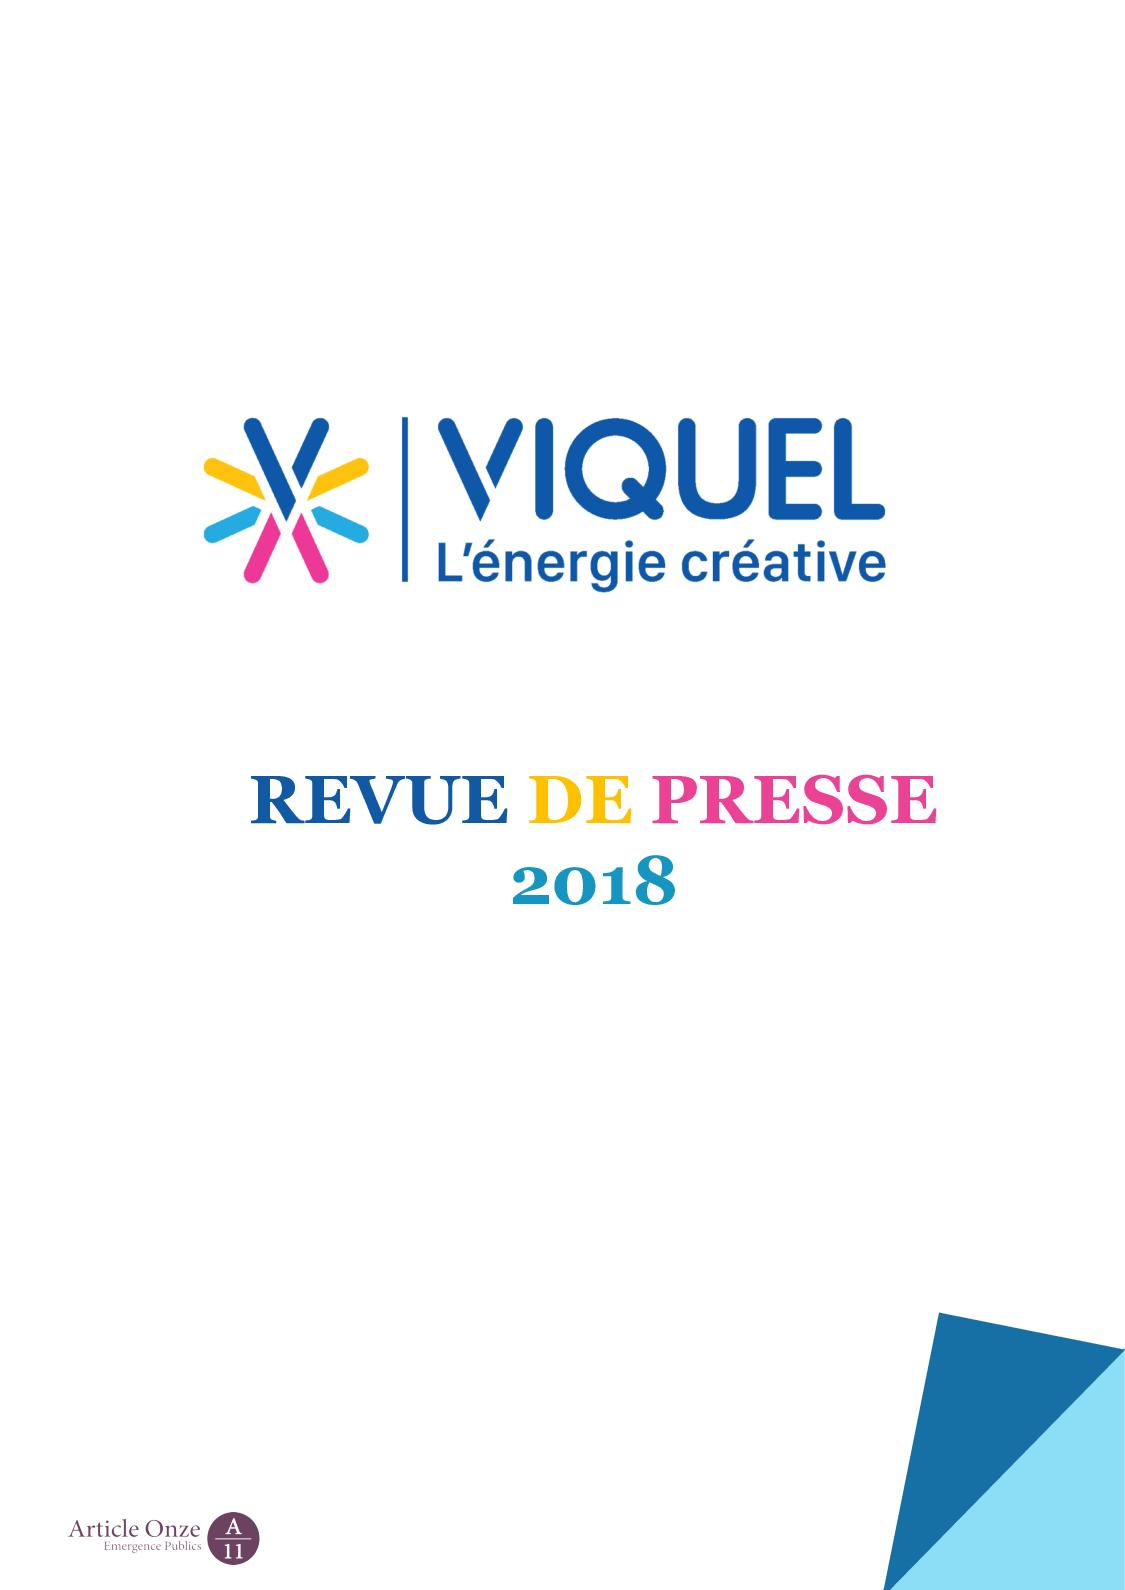 Calaméo De revue 2018 Viquel Presse rxBoedC